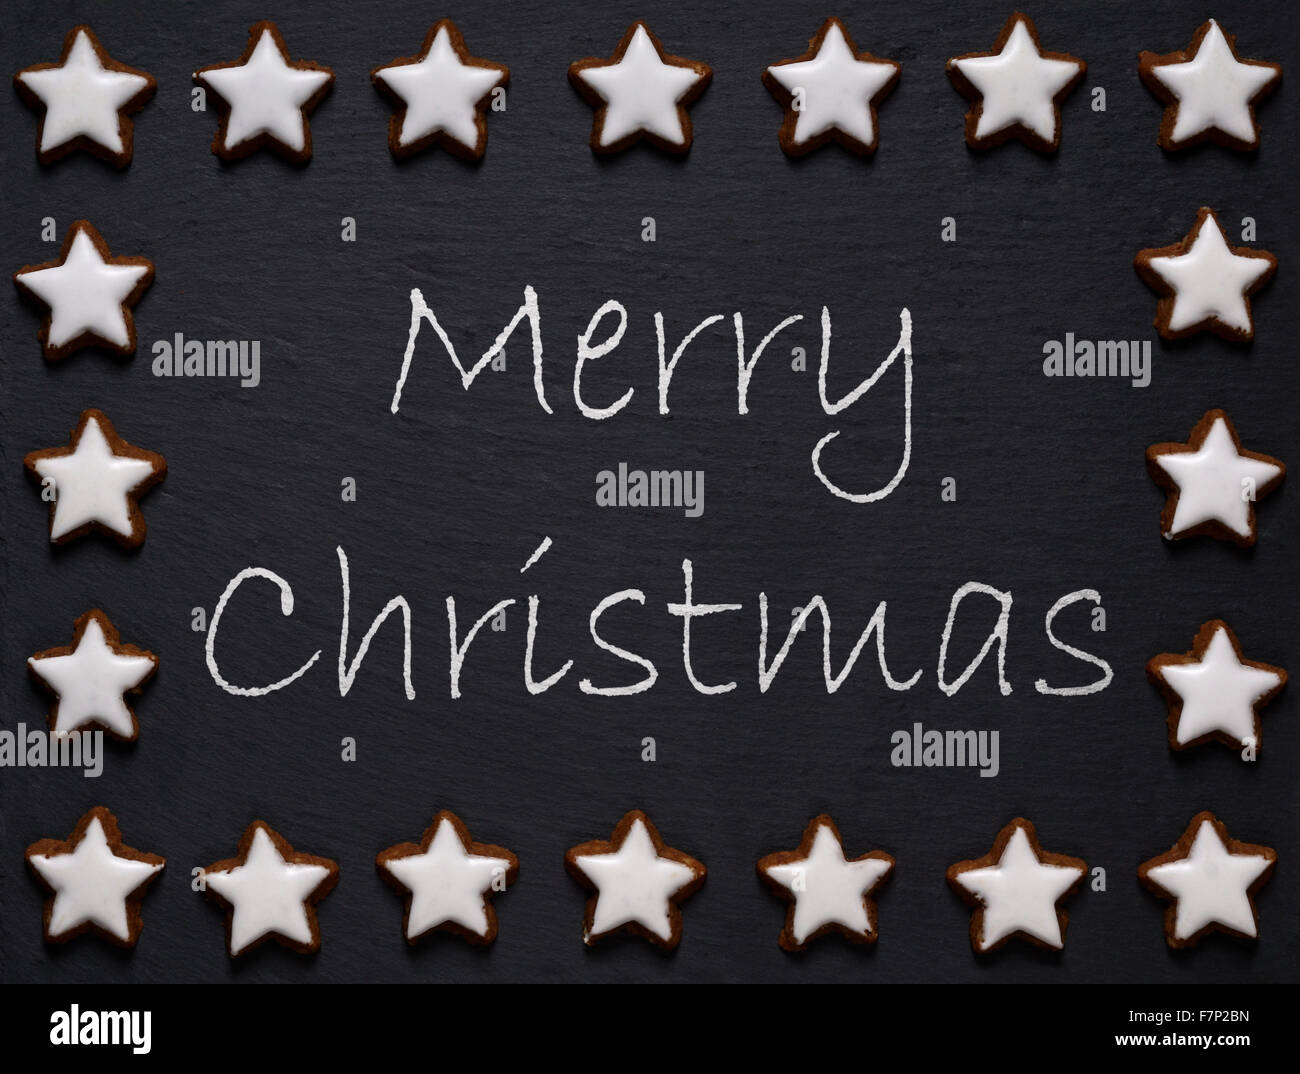 german merry christmas card stockfotos german merry. Black Bedroom Furniture Sets. Home Design Ideas